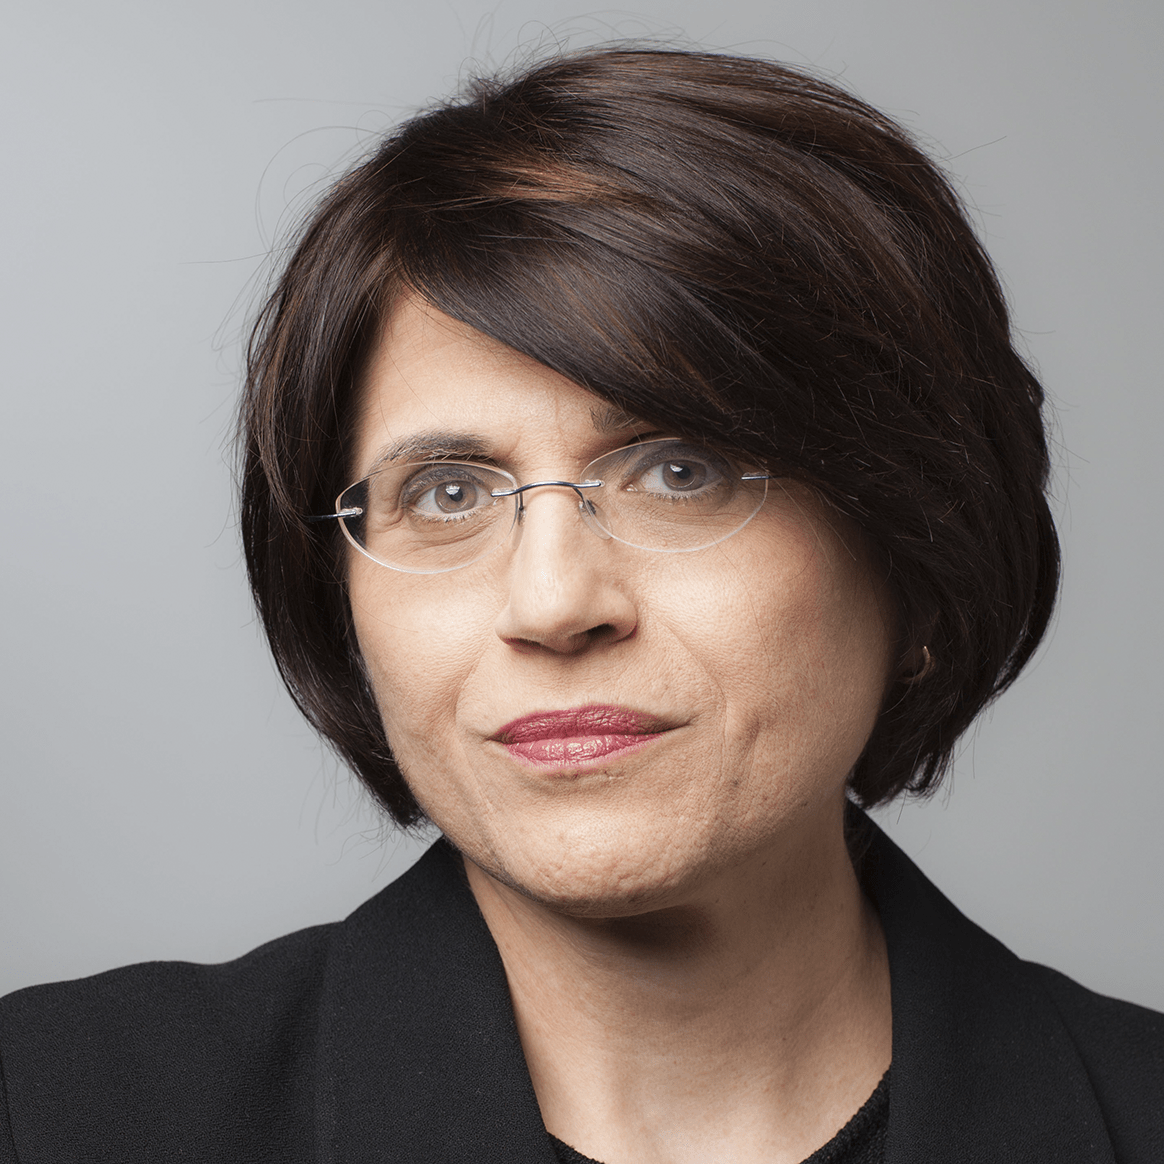 Headshot of Penn State Department of Architecture associate professor Shadi Nazarian